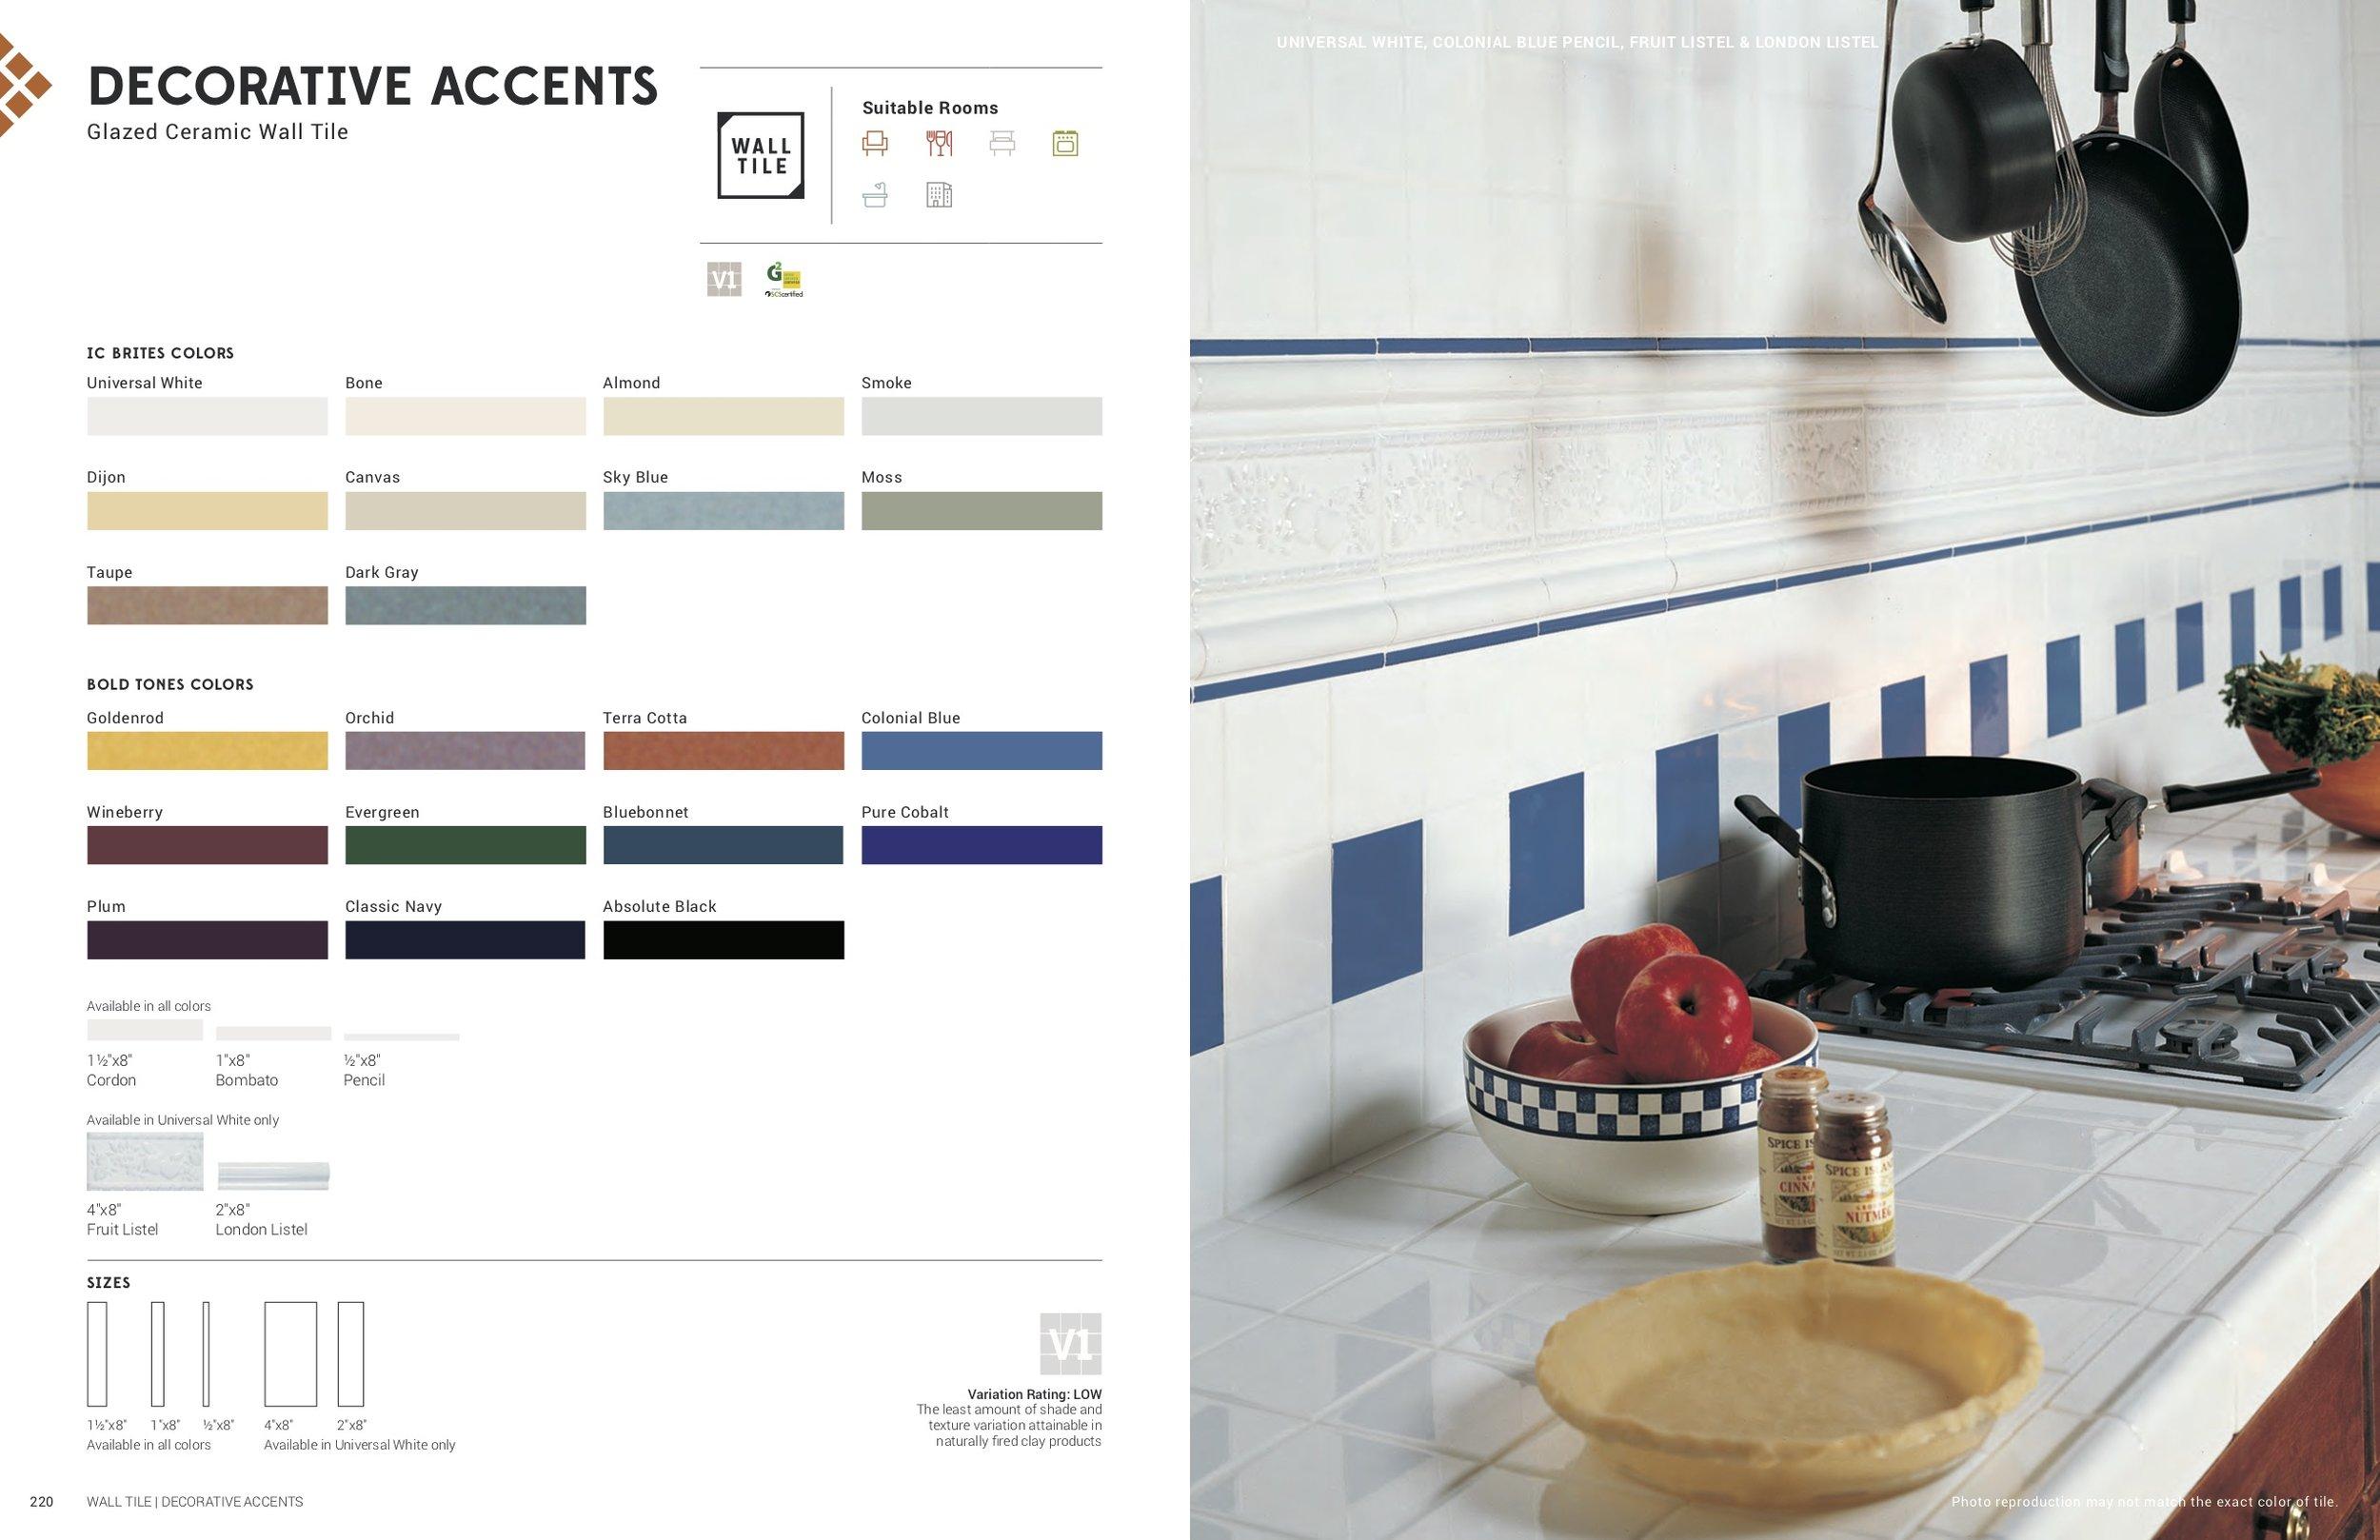 Interceramic_DEAC_Decorative_Accents_USHOJA_DE_CATALOGO-004714.jpg